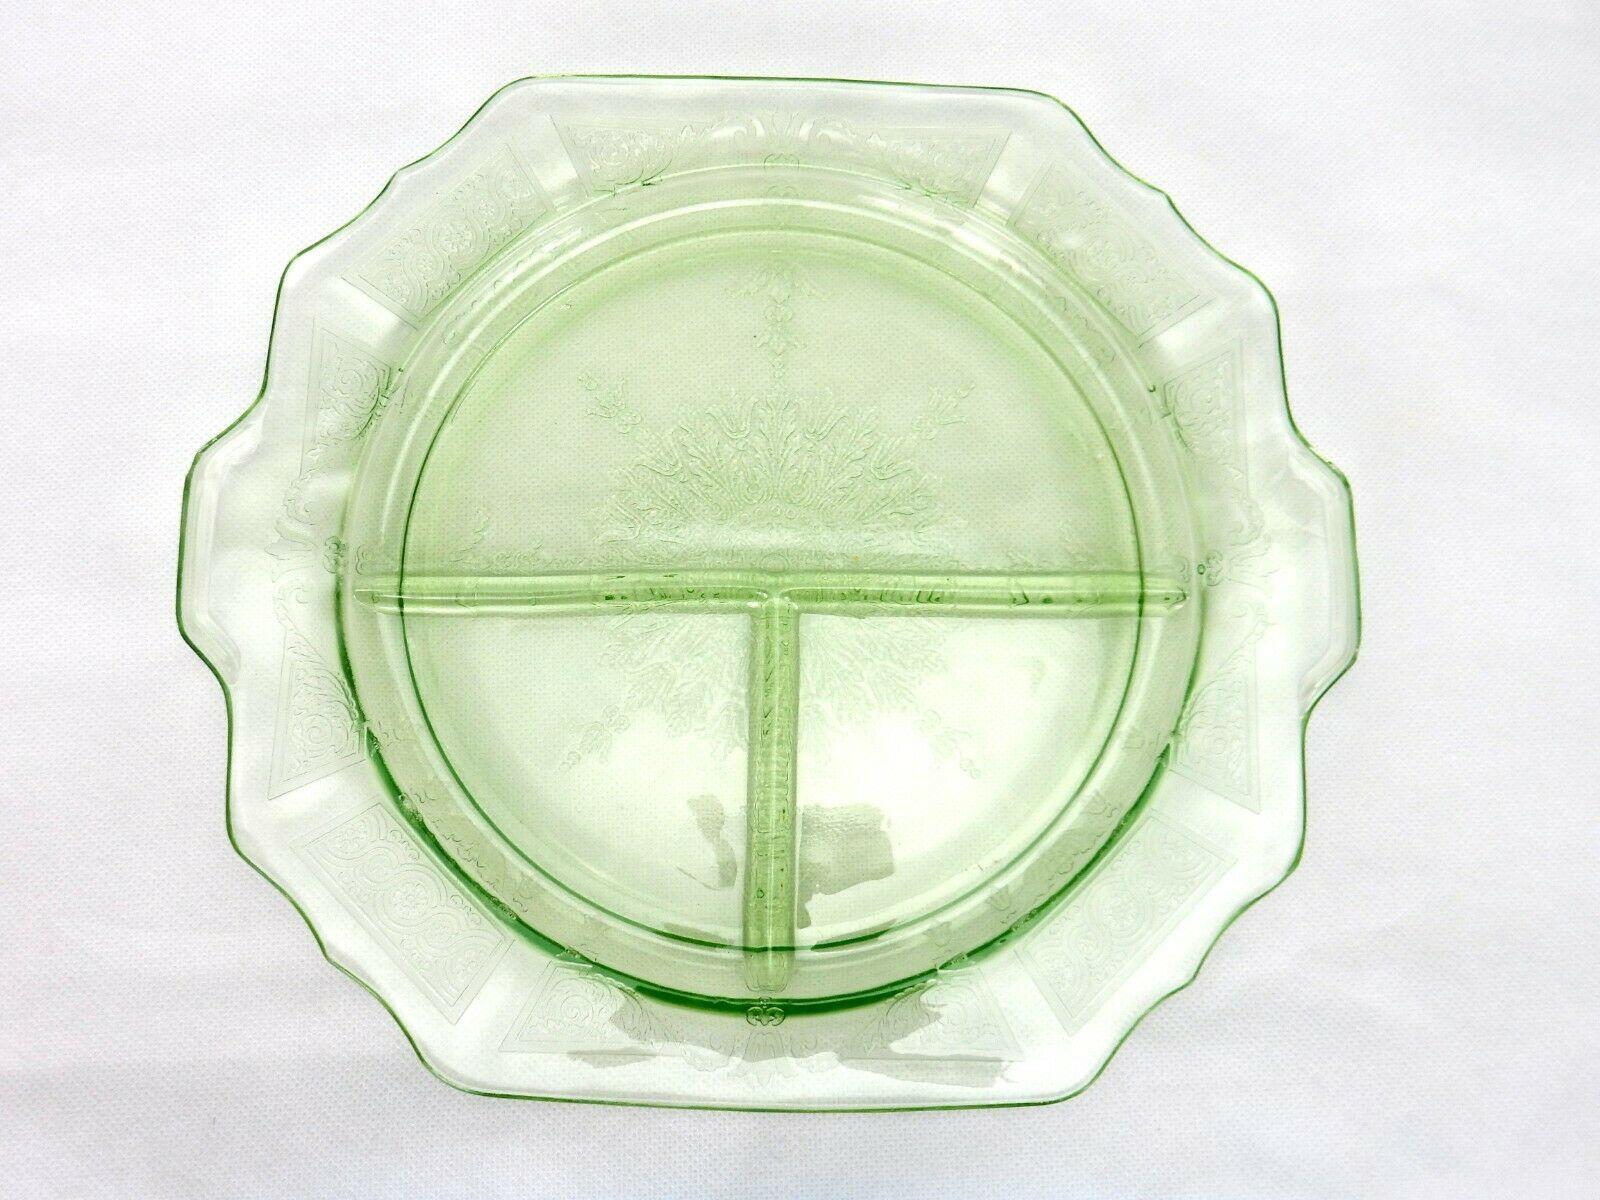 Hocking Glass Princess 10 12 Grill Plate